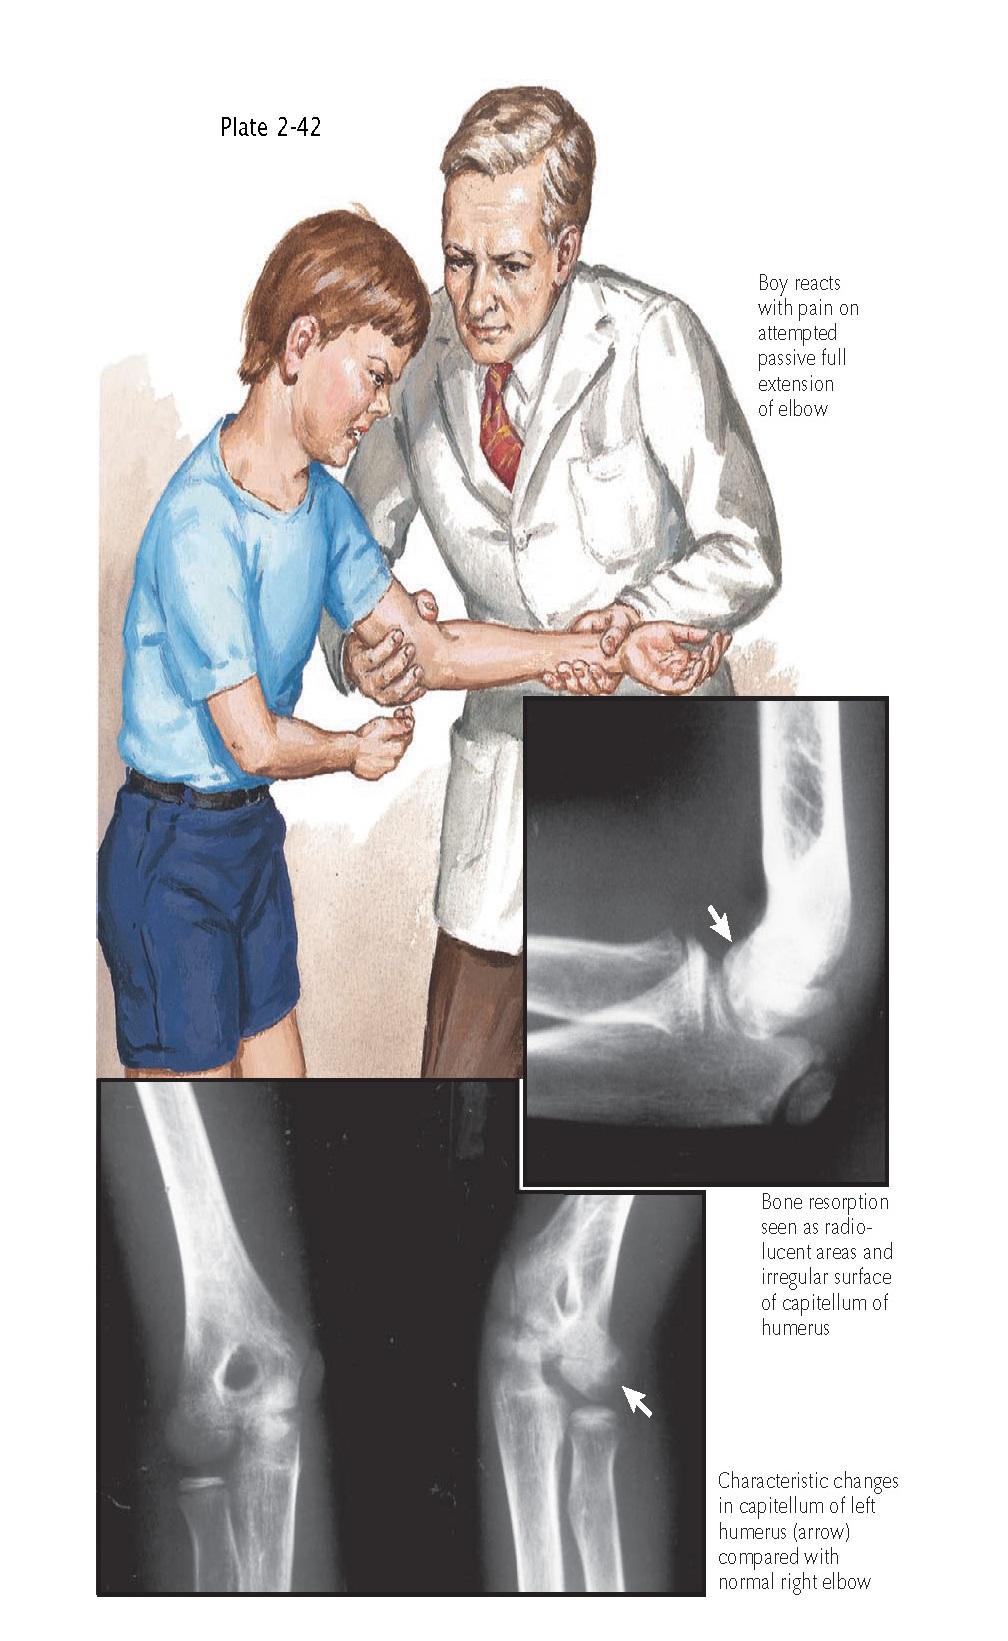 ROSIS OF THE ELBOW (PANNER DISEASE)